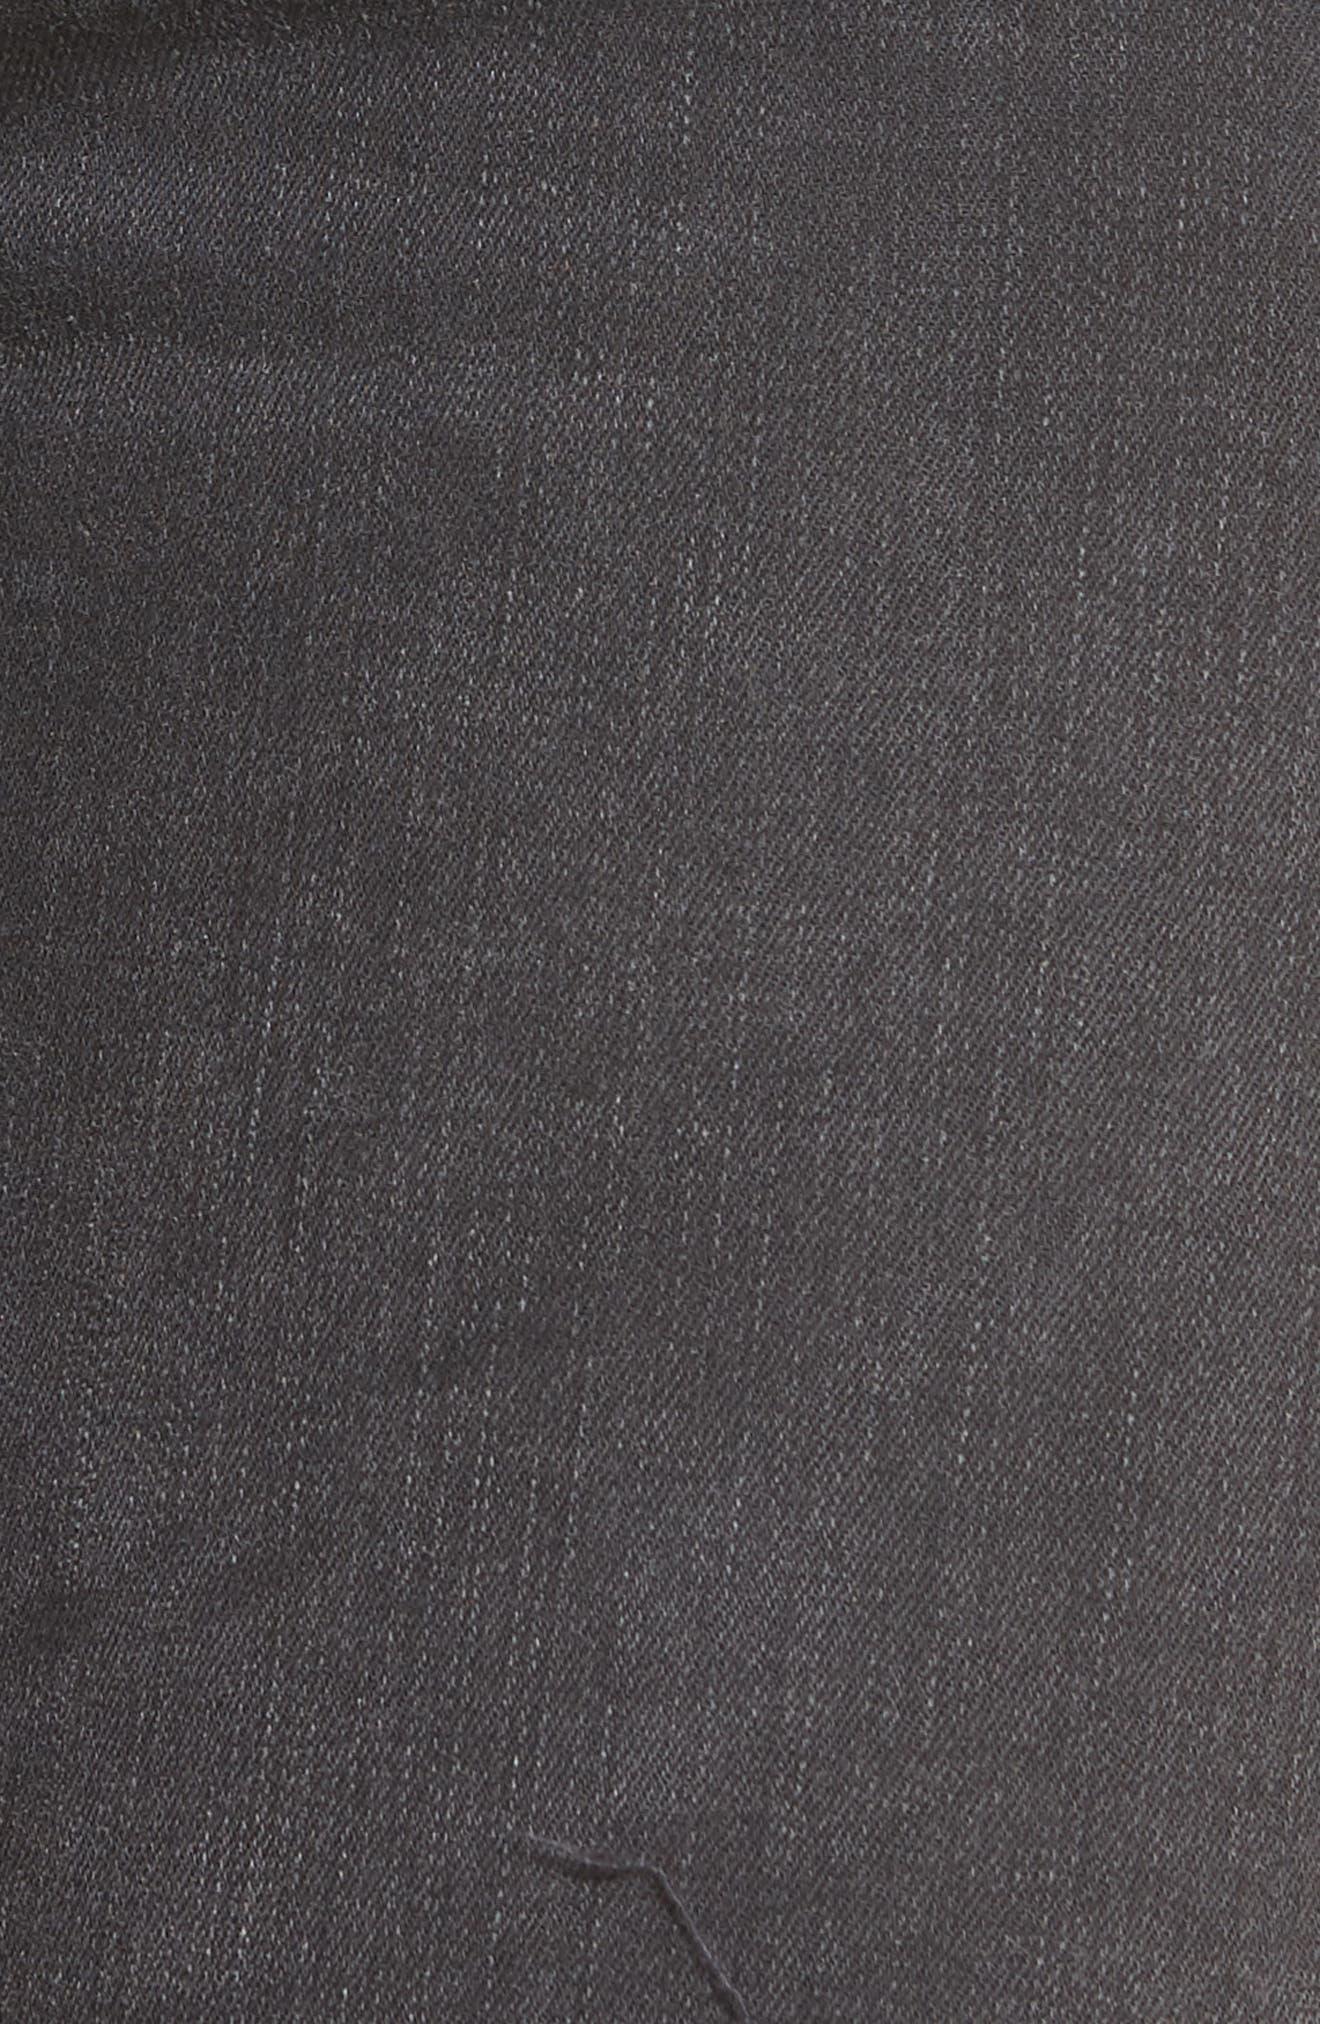 Newton Skinny Jeans,                             Alternate thumbnail 5, color,                             011